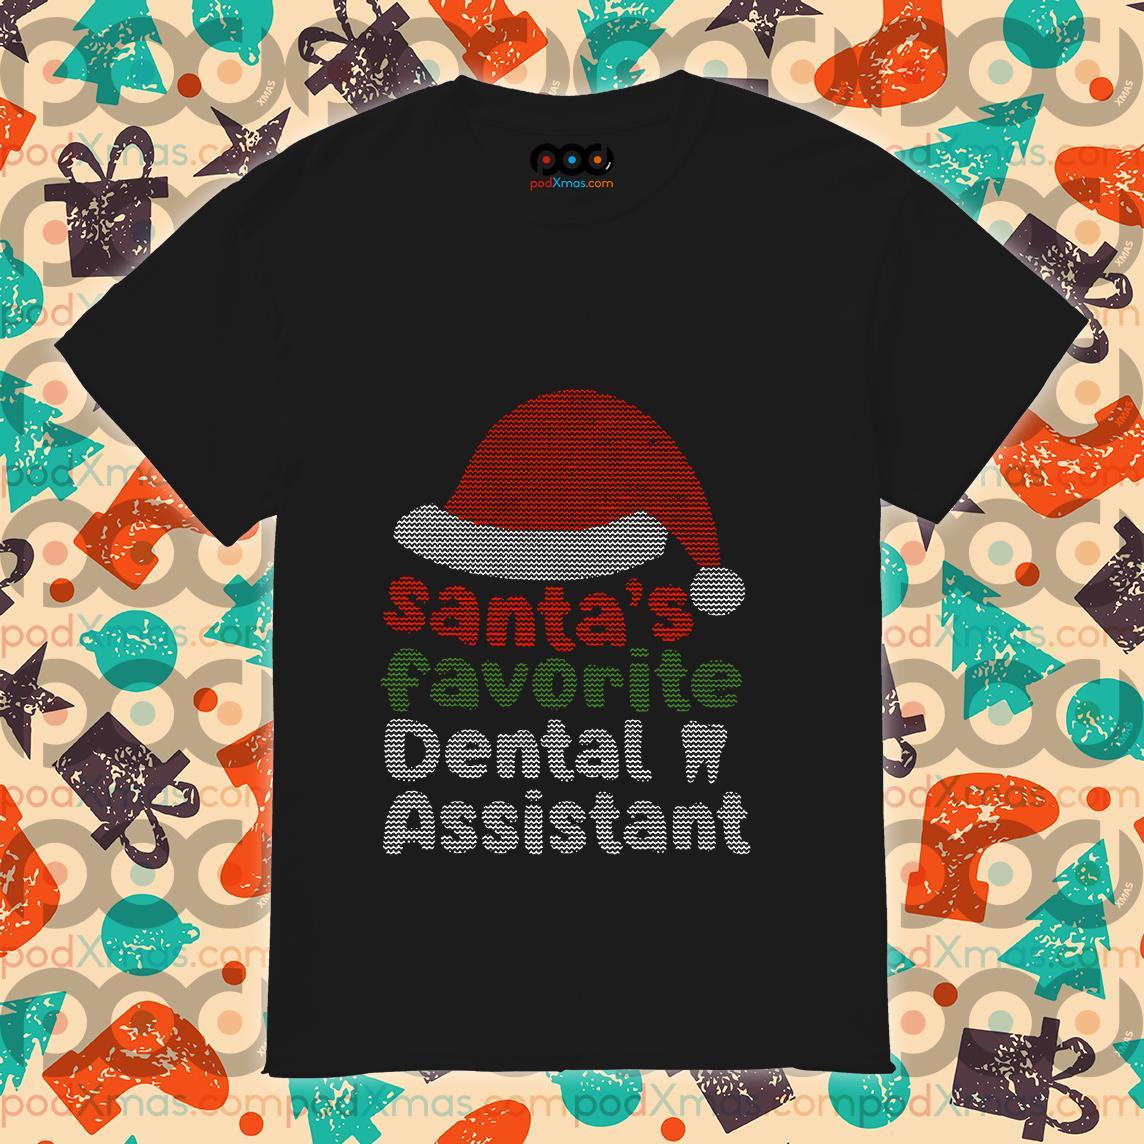 Santa's Favourite Dental Assistant shirt